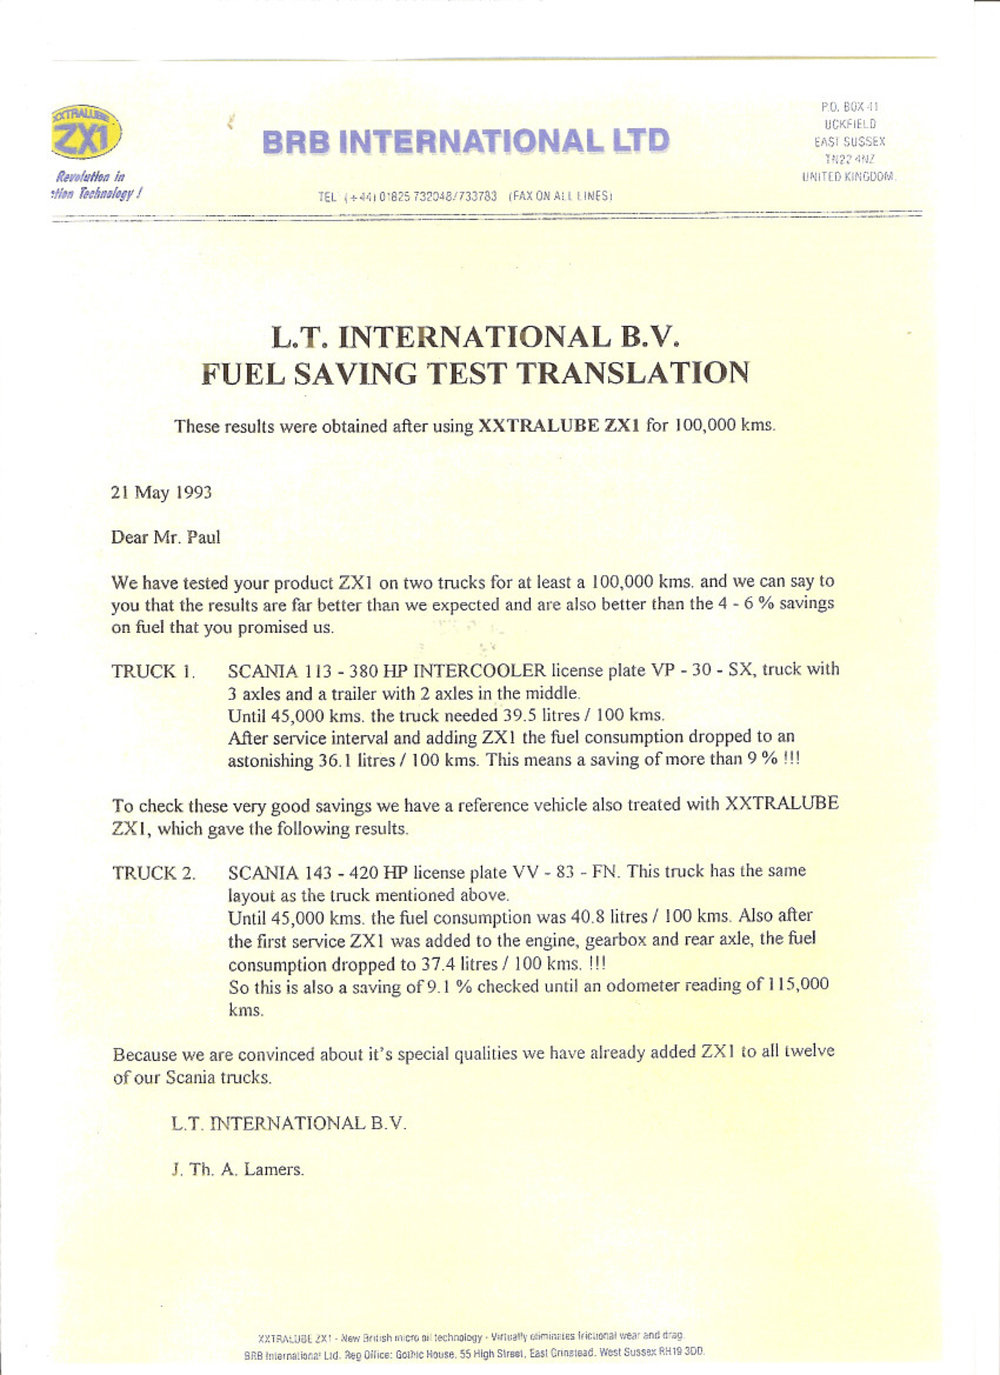 Scania Truck Fuel test.jpg